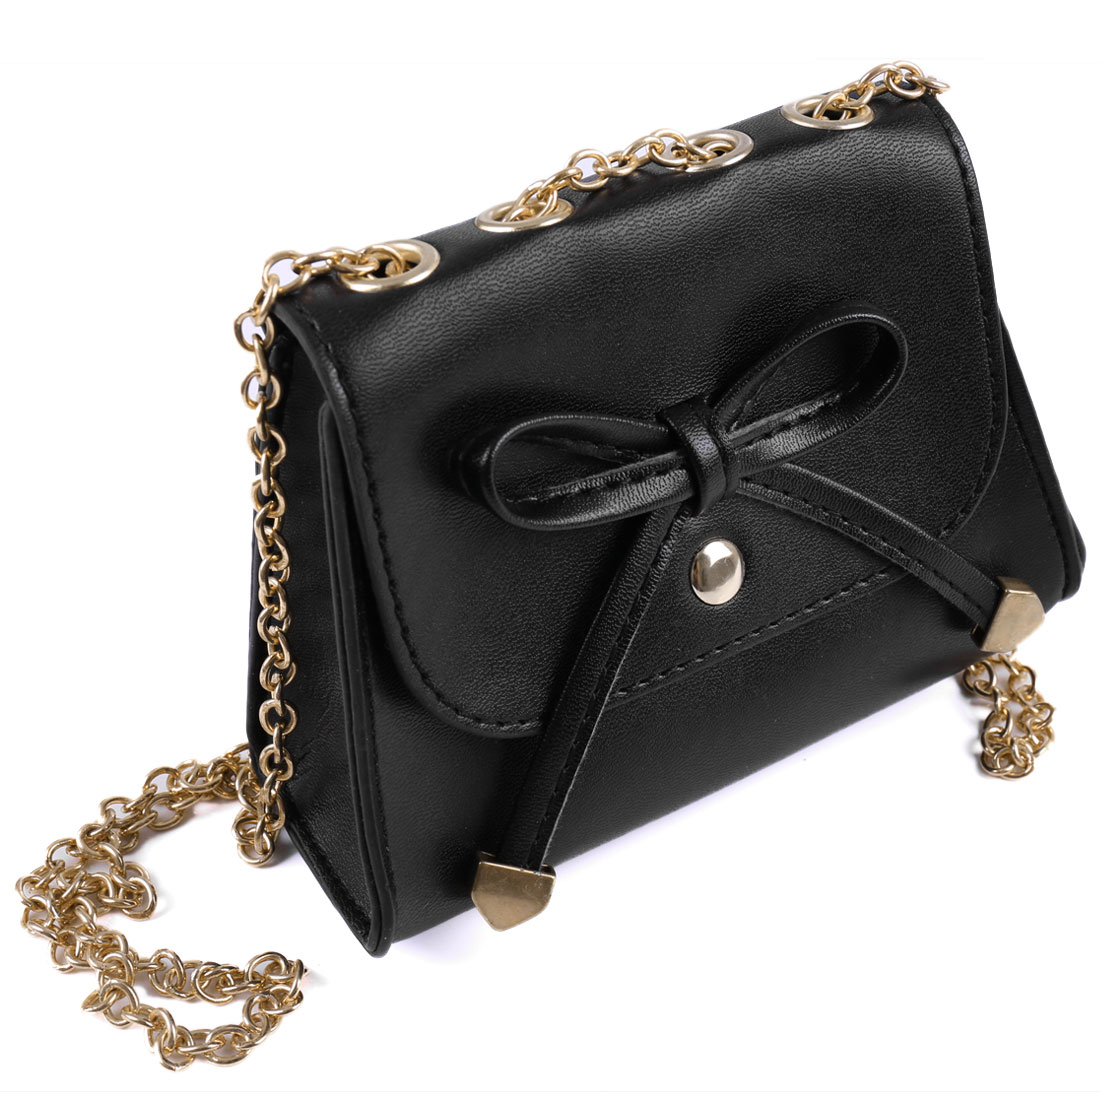 Bowknot Decor Faux Leather Gold Tone Chain Magnetic Flap Closure Handbag Black